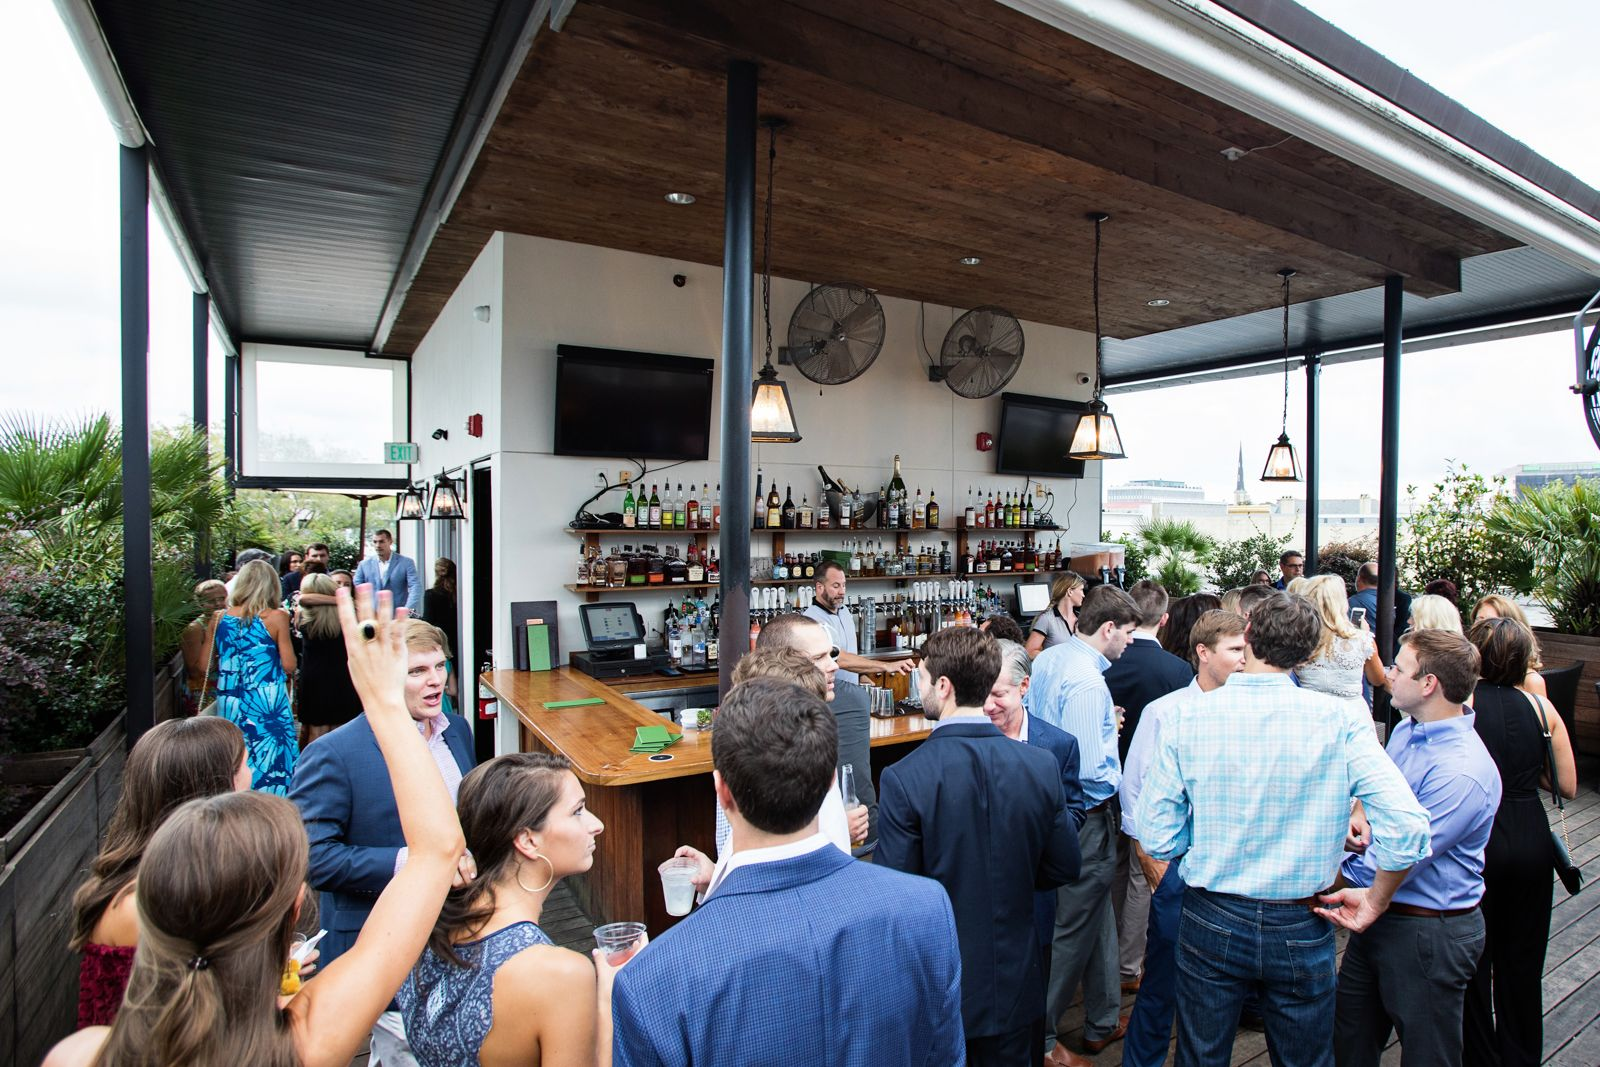 Best Rooftop Bar Charleston SC - Rooftop Drinks | Best ...